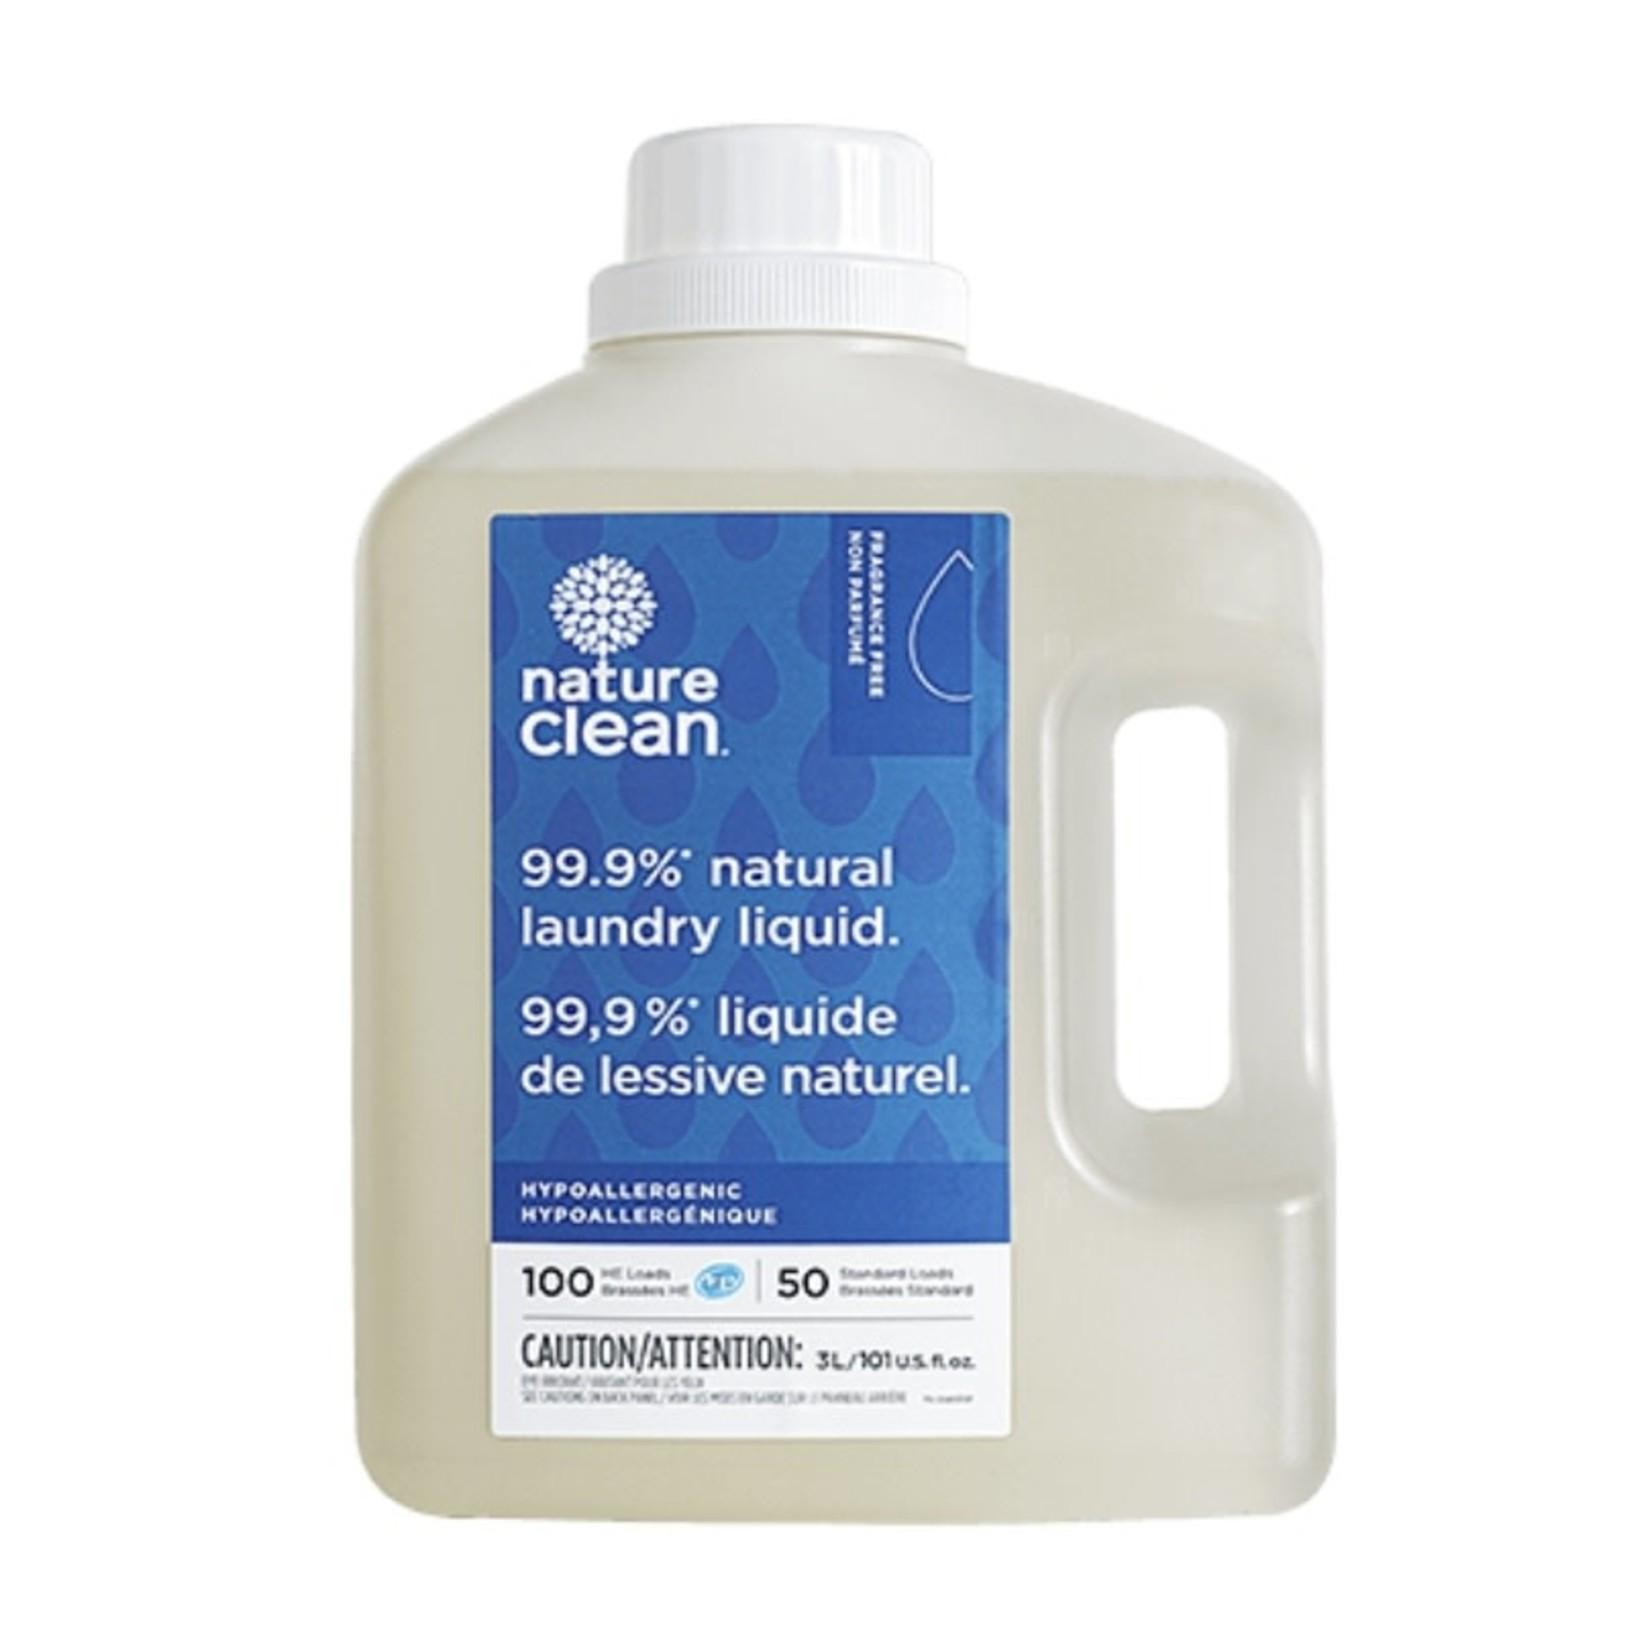 Nature Clean Nature Clean Laundry Liquid 3L